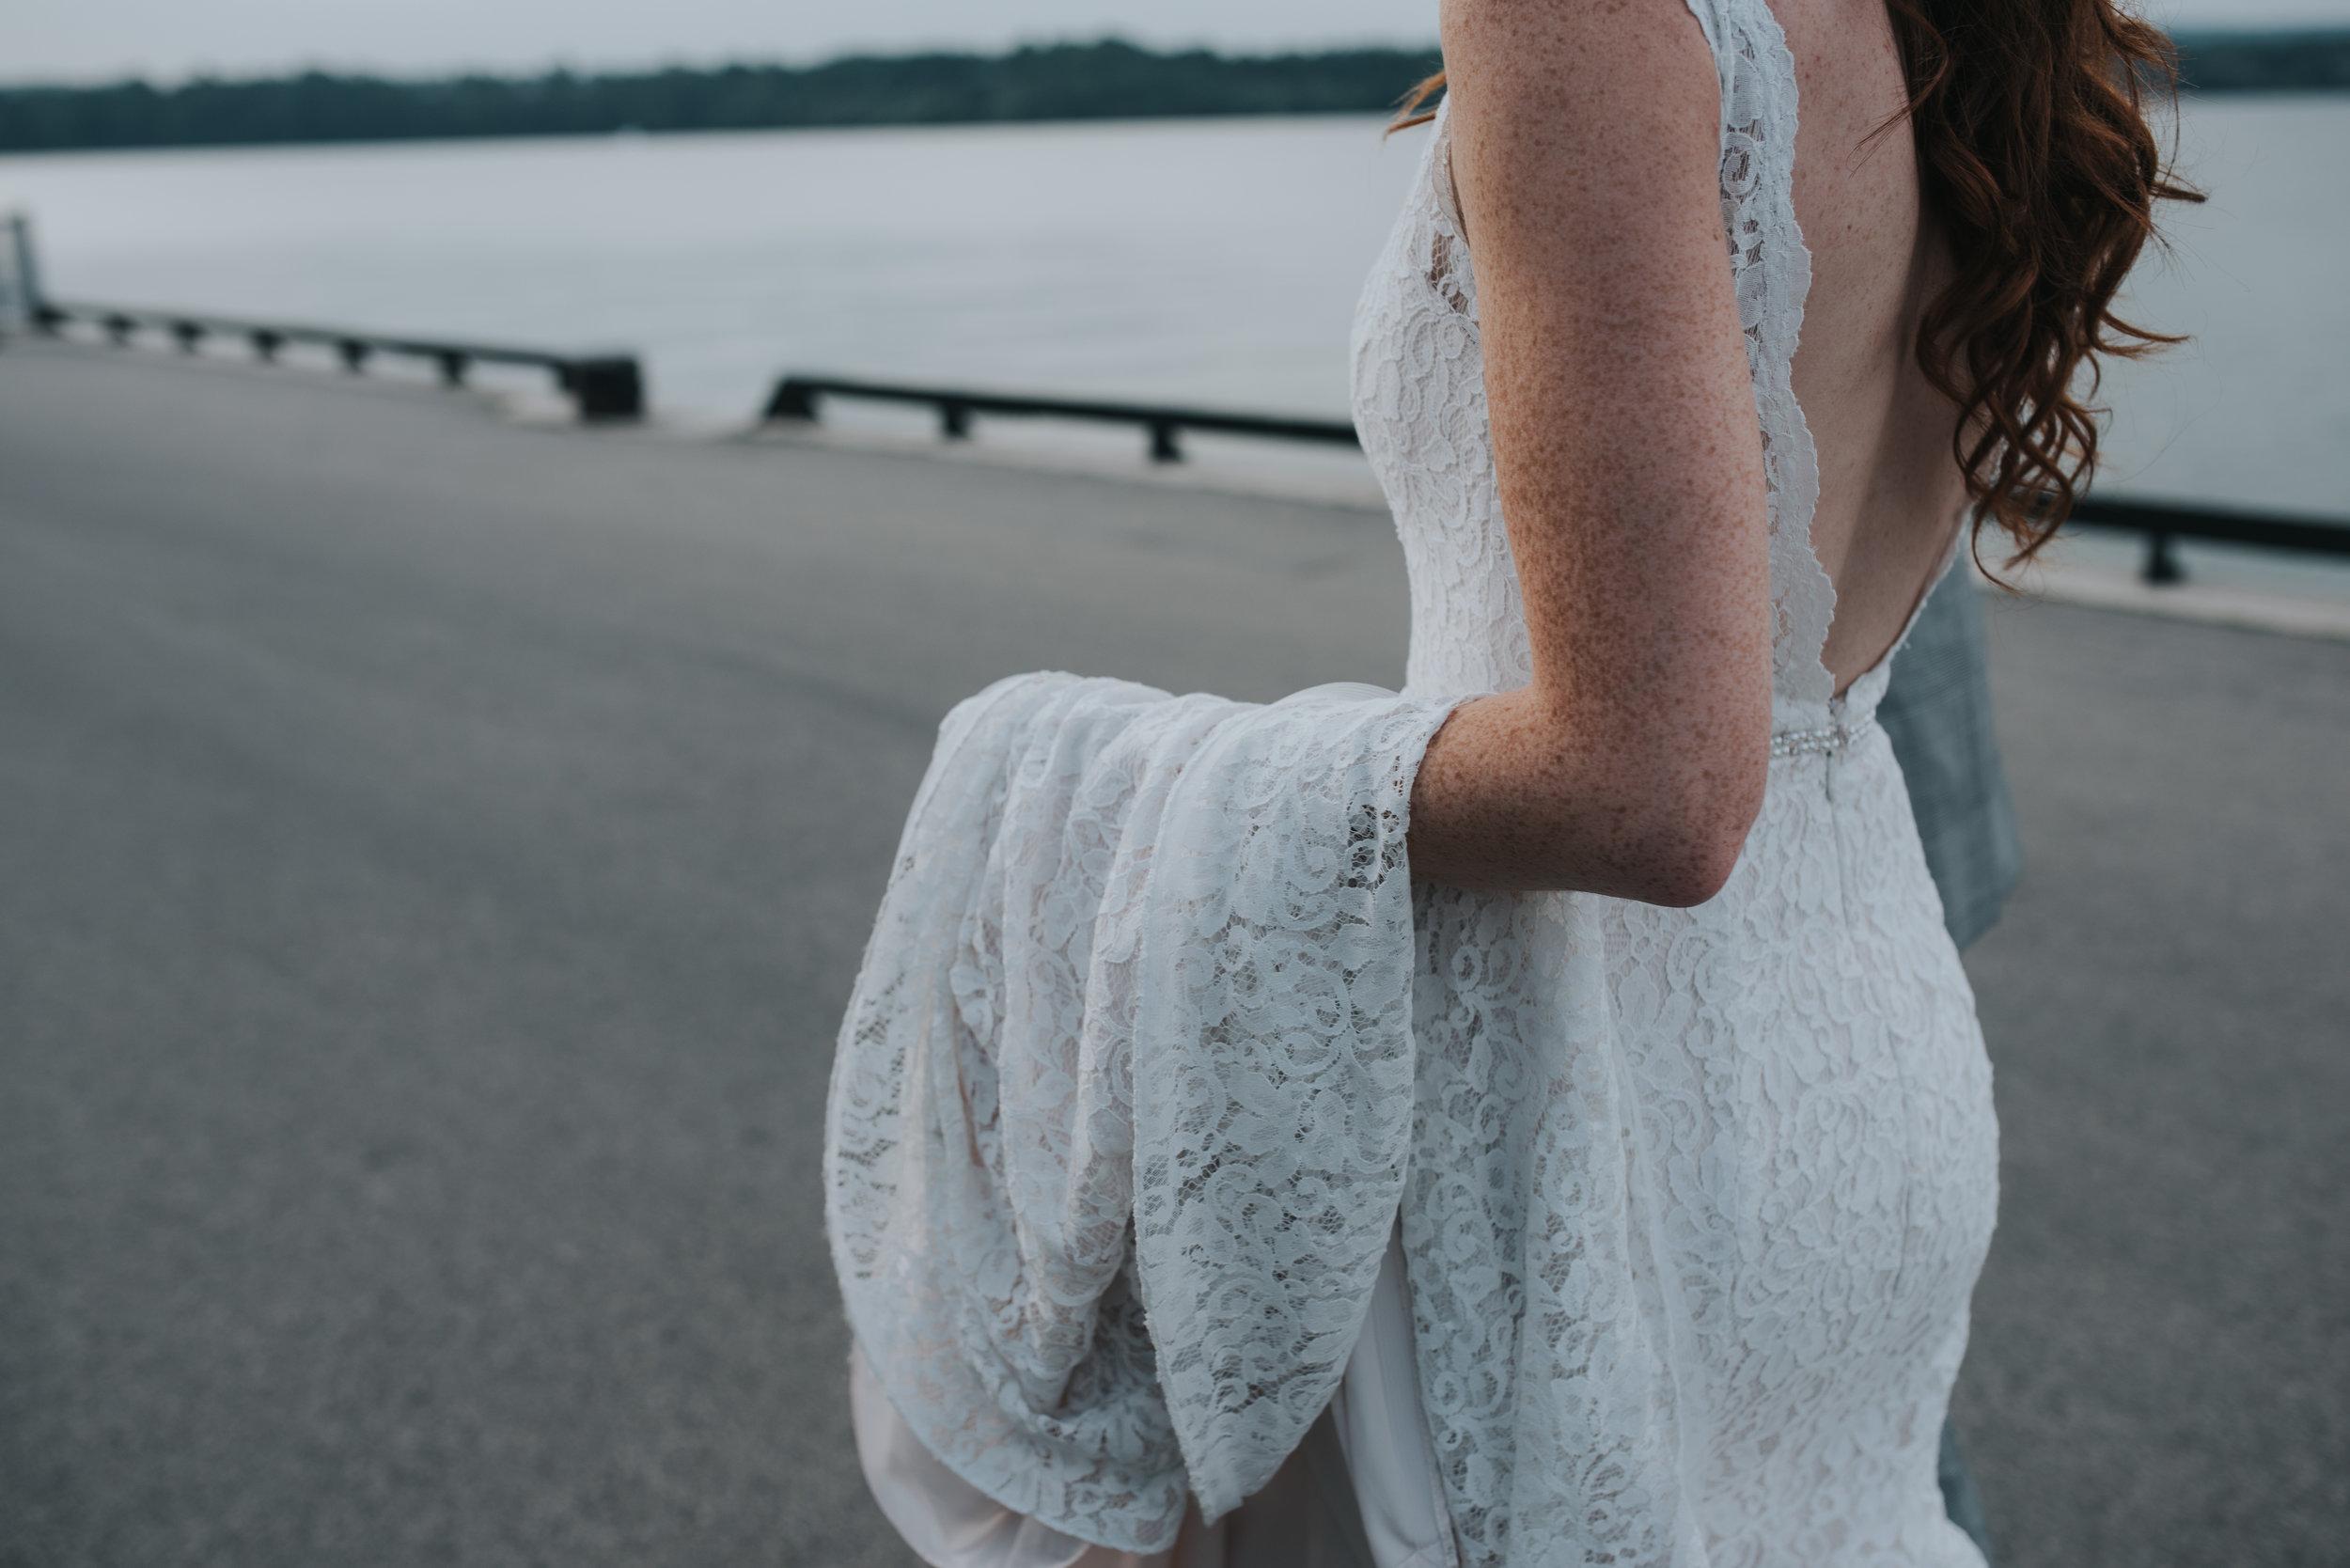 bride-groom-walking-back-to-reception-toronto-outdoor-summer-wedding-documentary-wedding-photography-by-willow-birch-photo.jpg